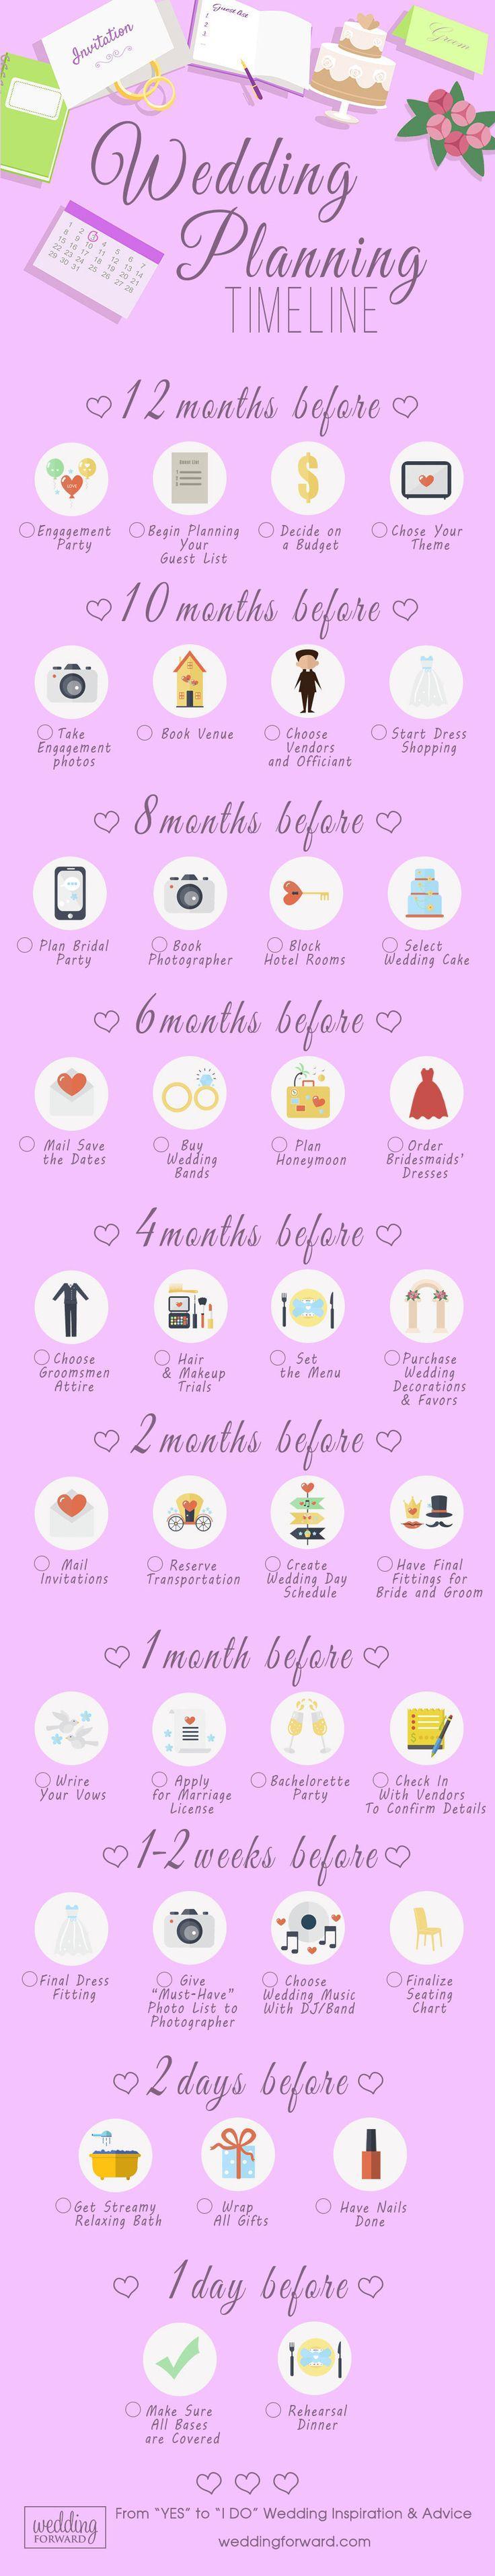 Thème De Mariage 12 Month Wedding Planning Timeline 2714404